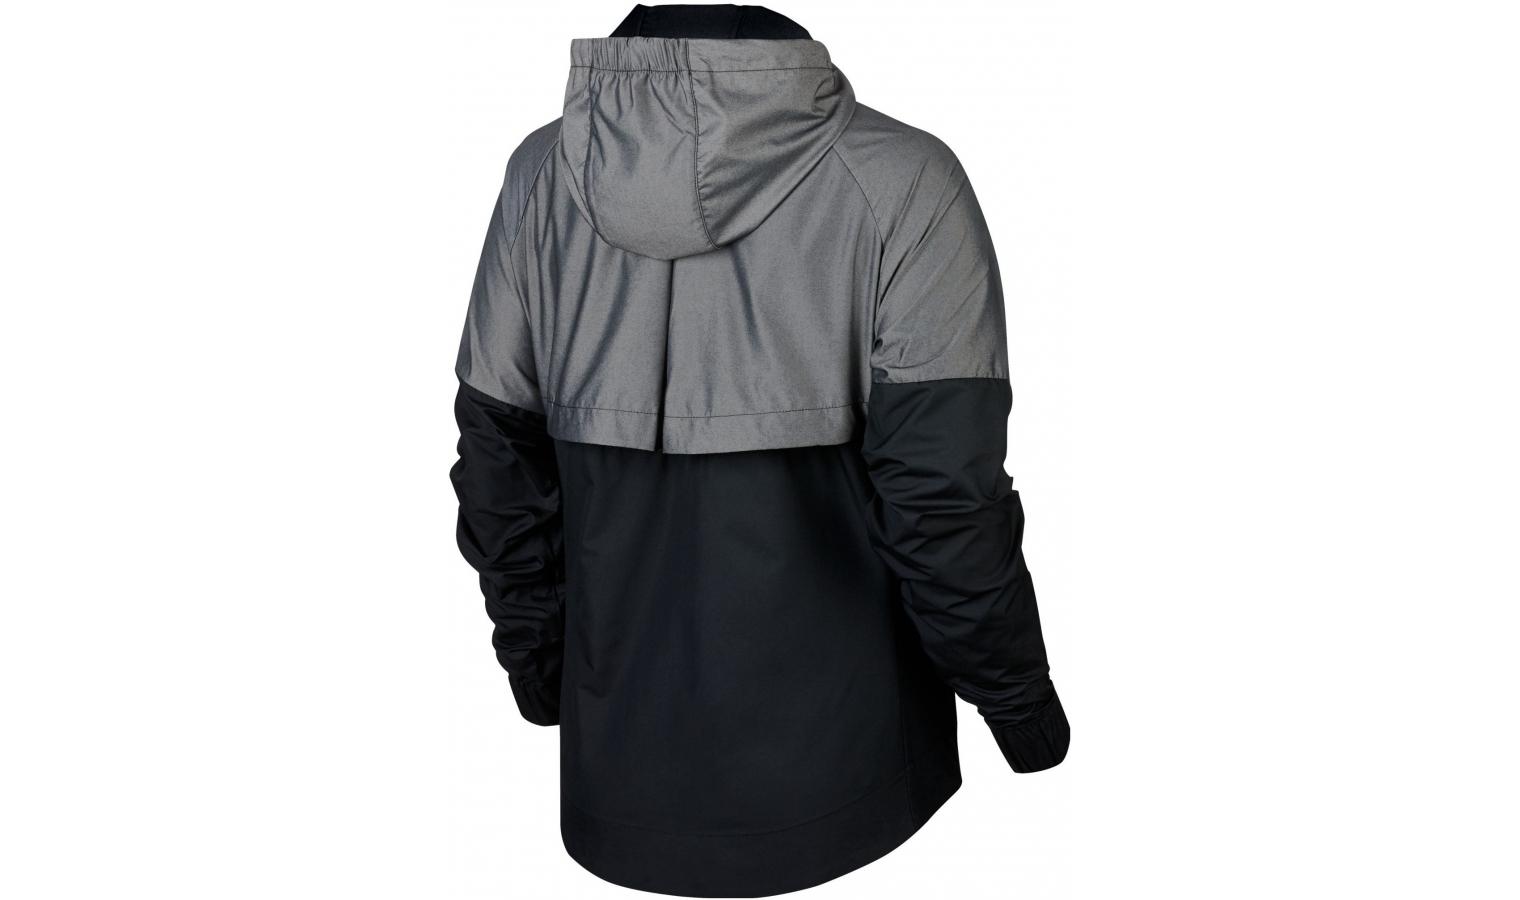 Dámská bunda Nike W NSW WR JKT CHAMBRAY W černá  a564de34e8